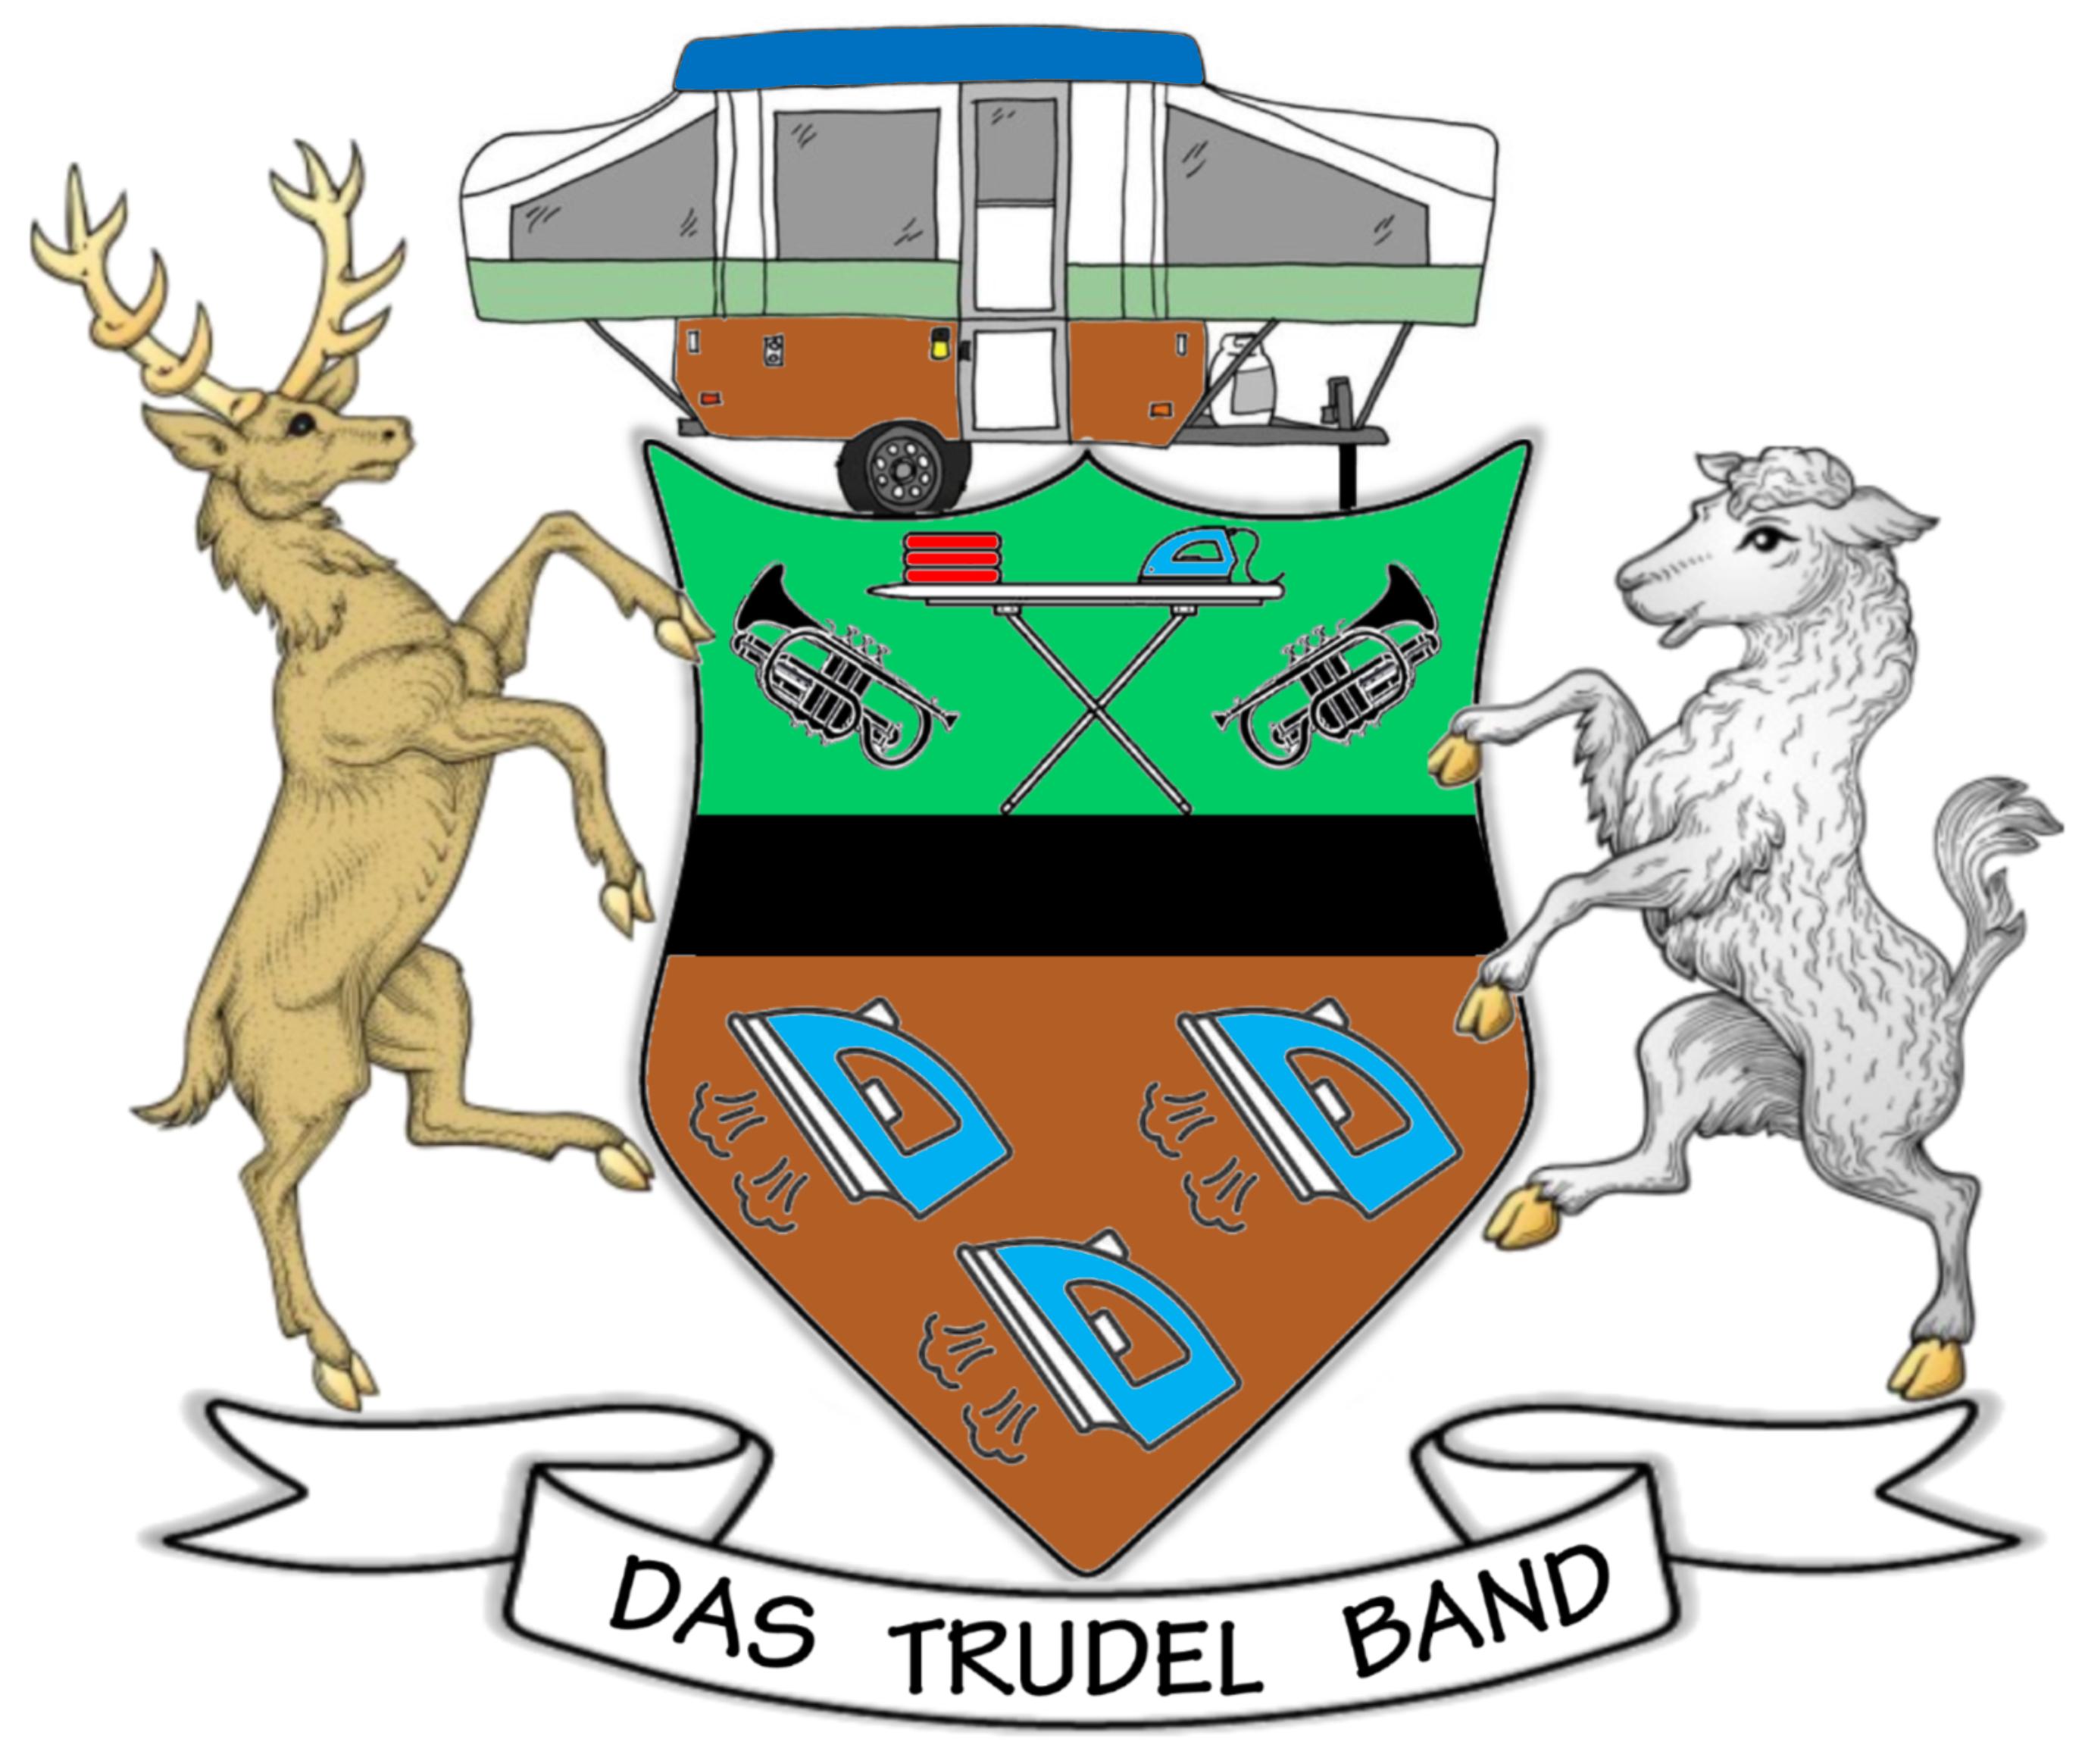 Das Trudel Band Logo